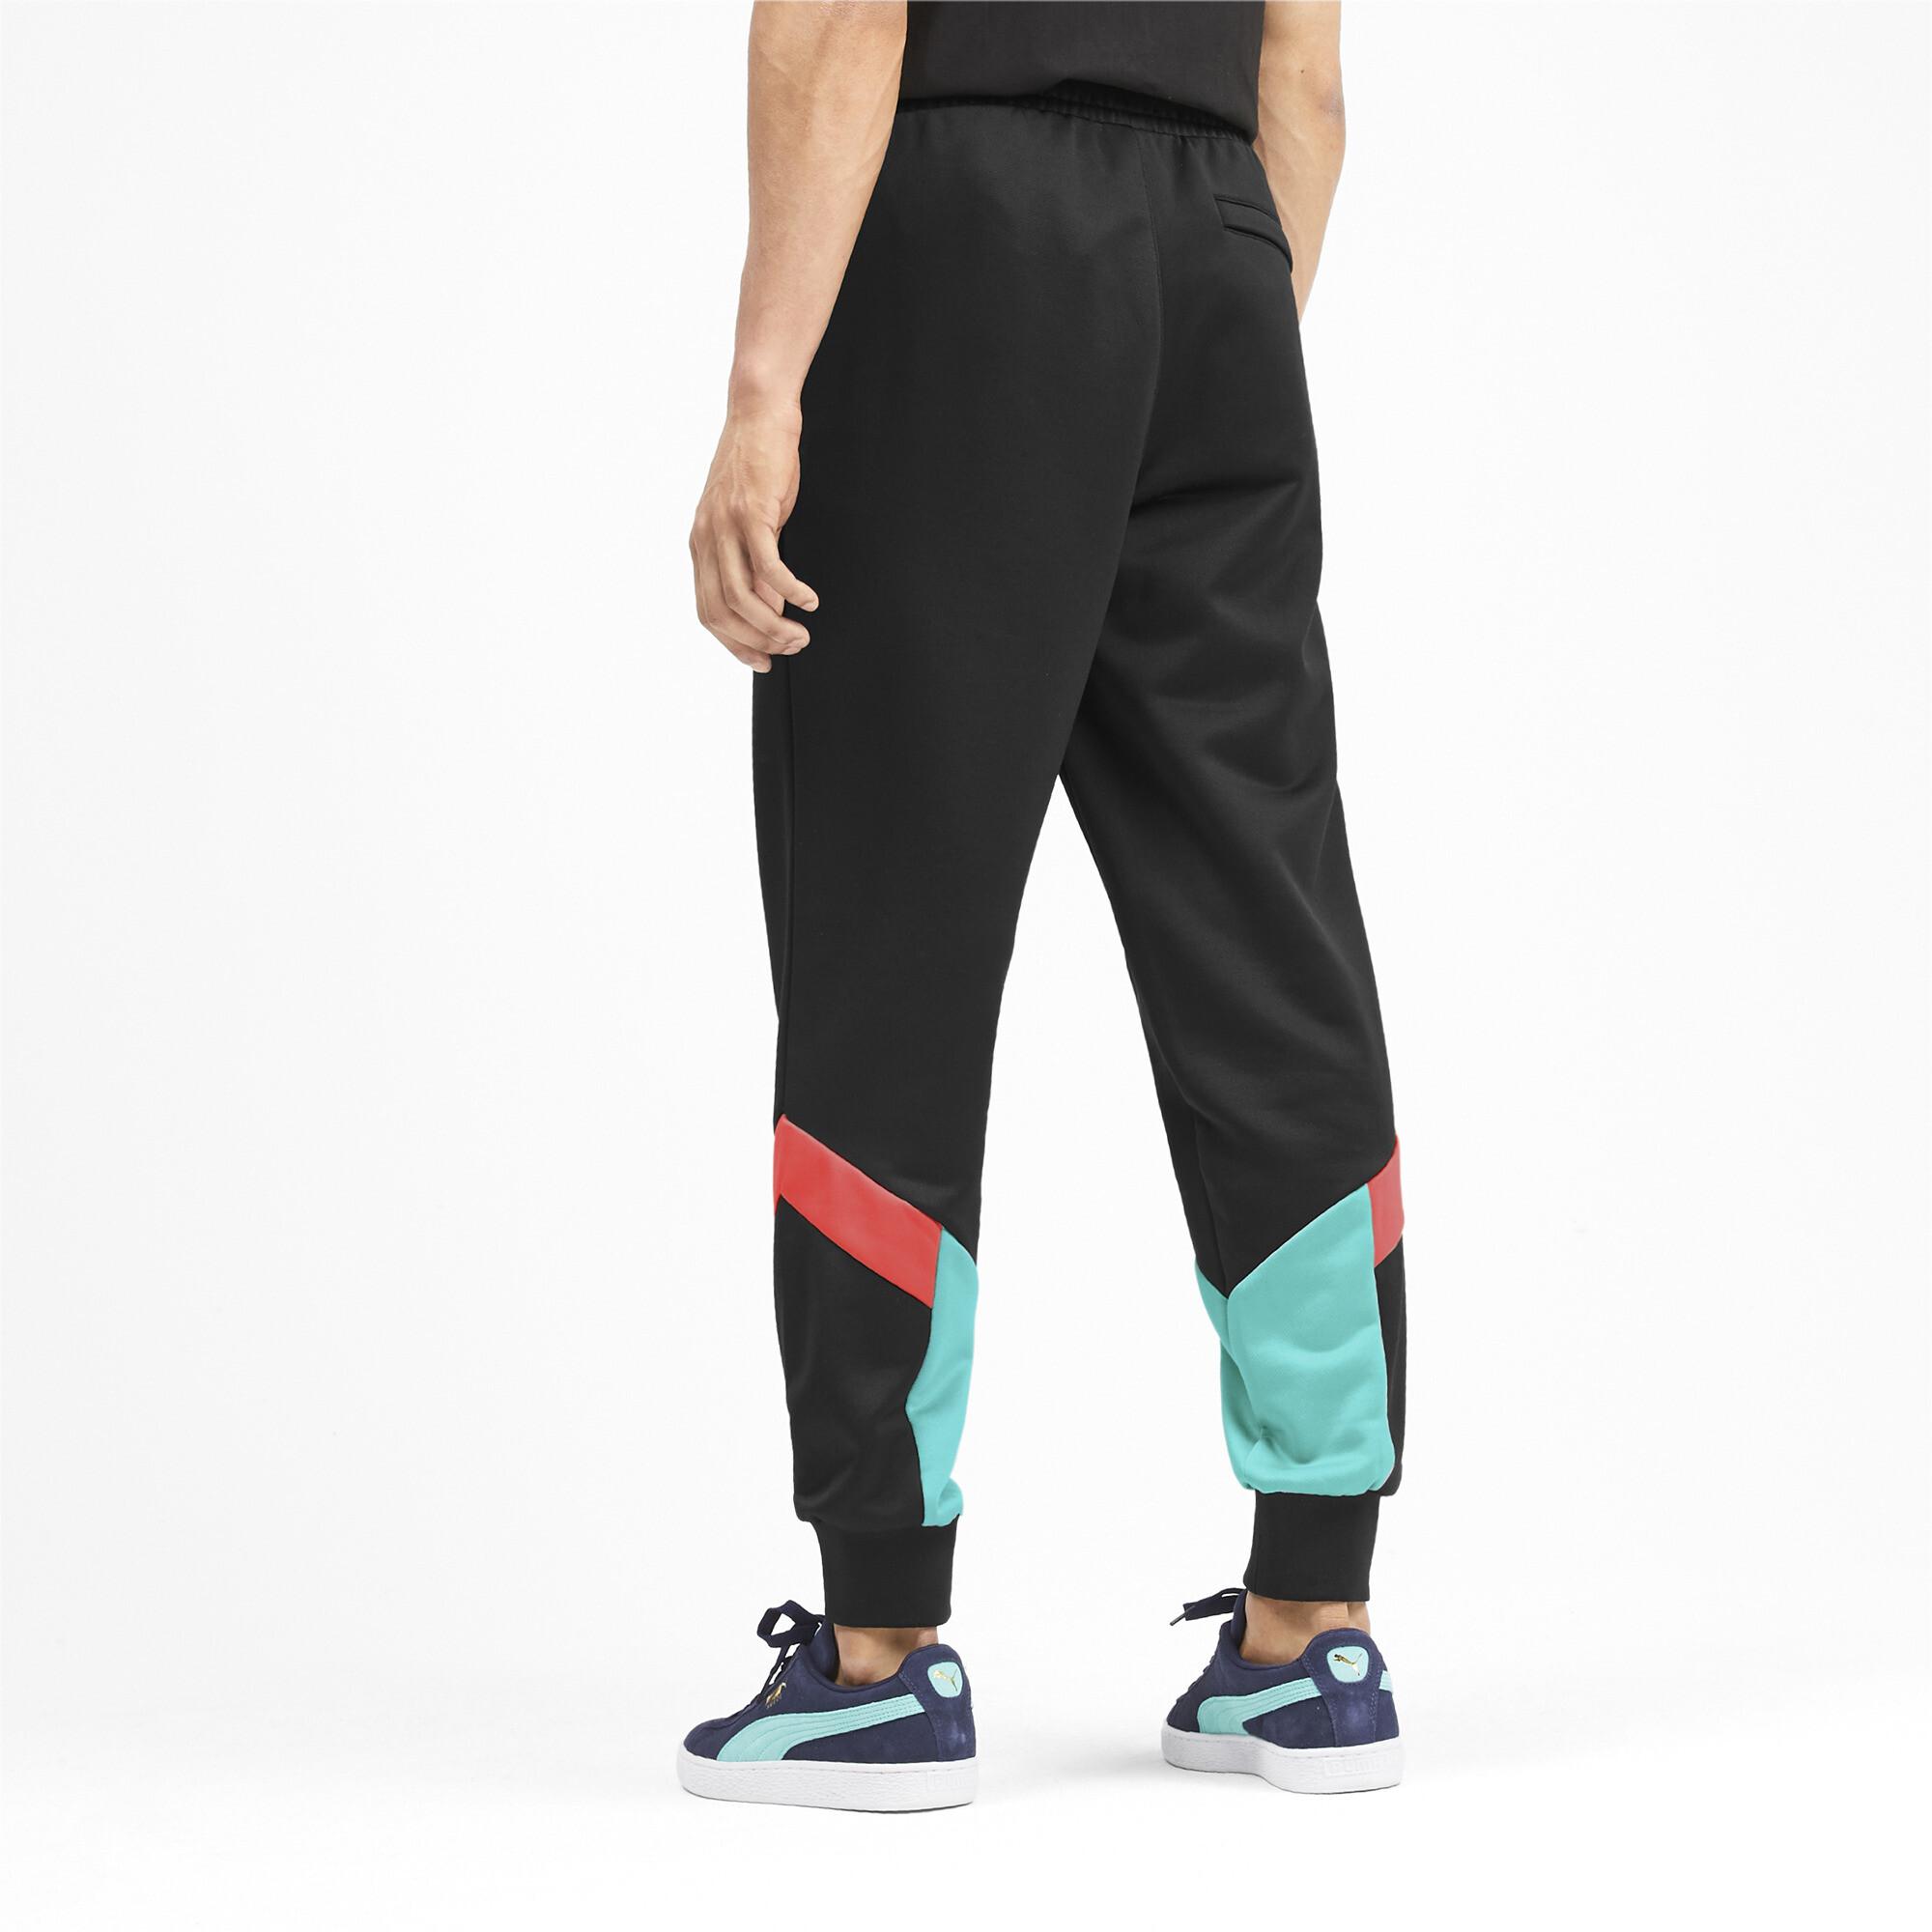 PUMA-Iconic-MCS-Men-039-s-Track-Pants-Men-Knitted-Pants-Sport-Classics thumbnail 16